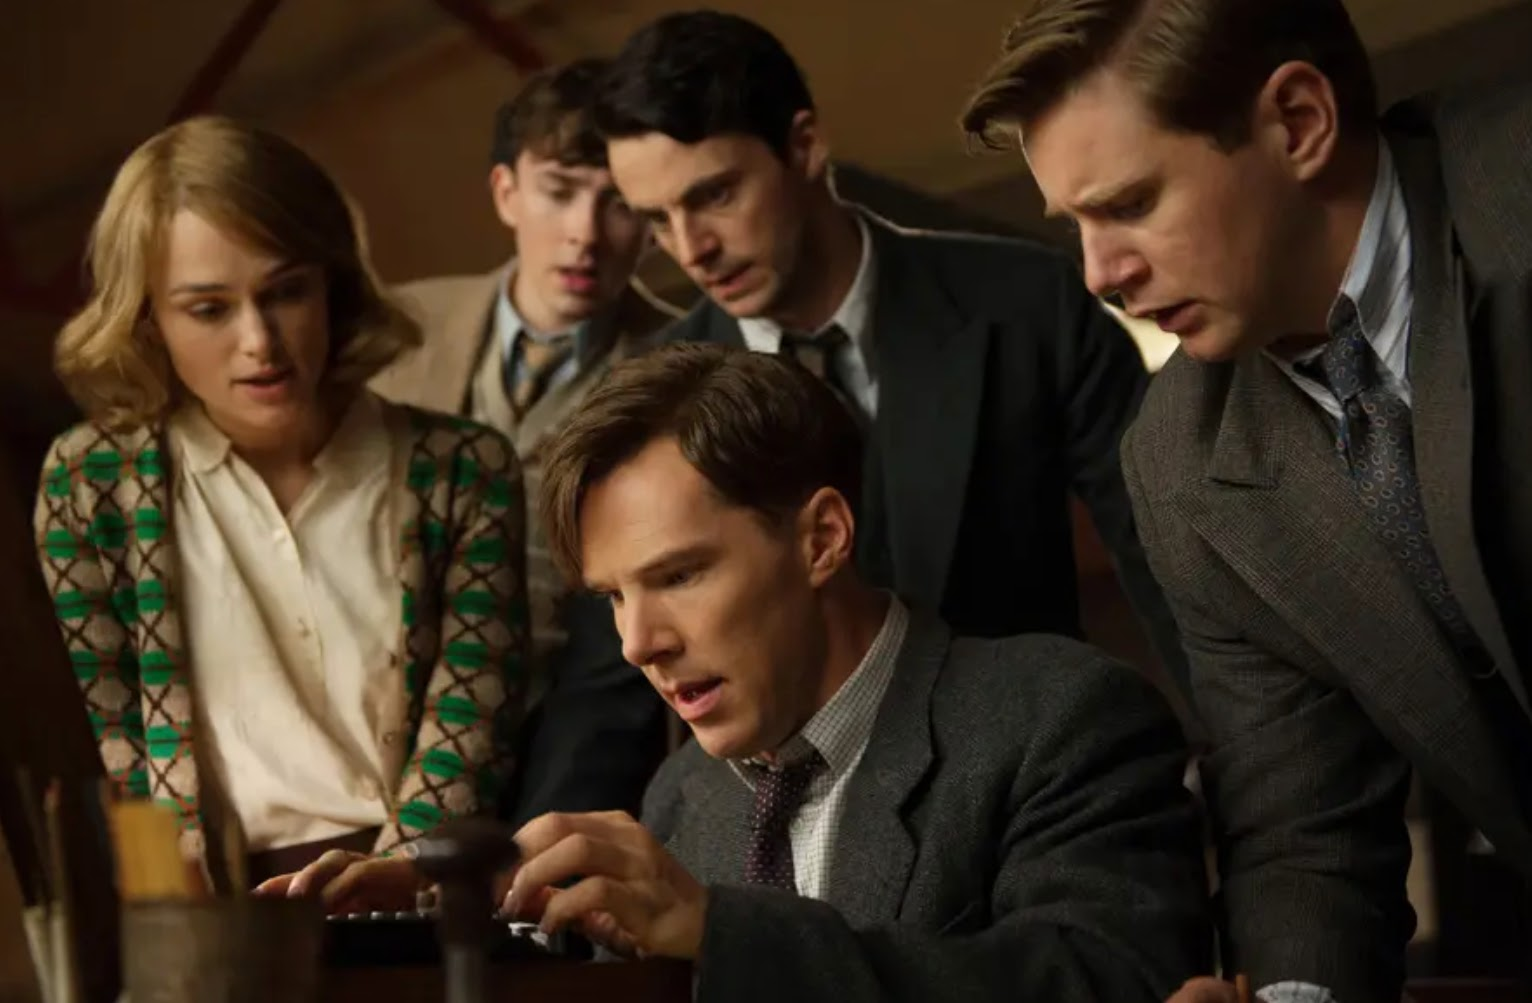 The Imitation Game with Benedict Cumberbatch